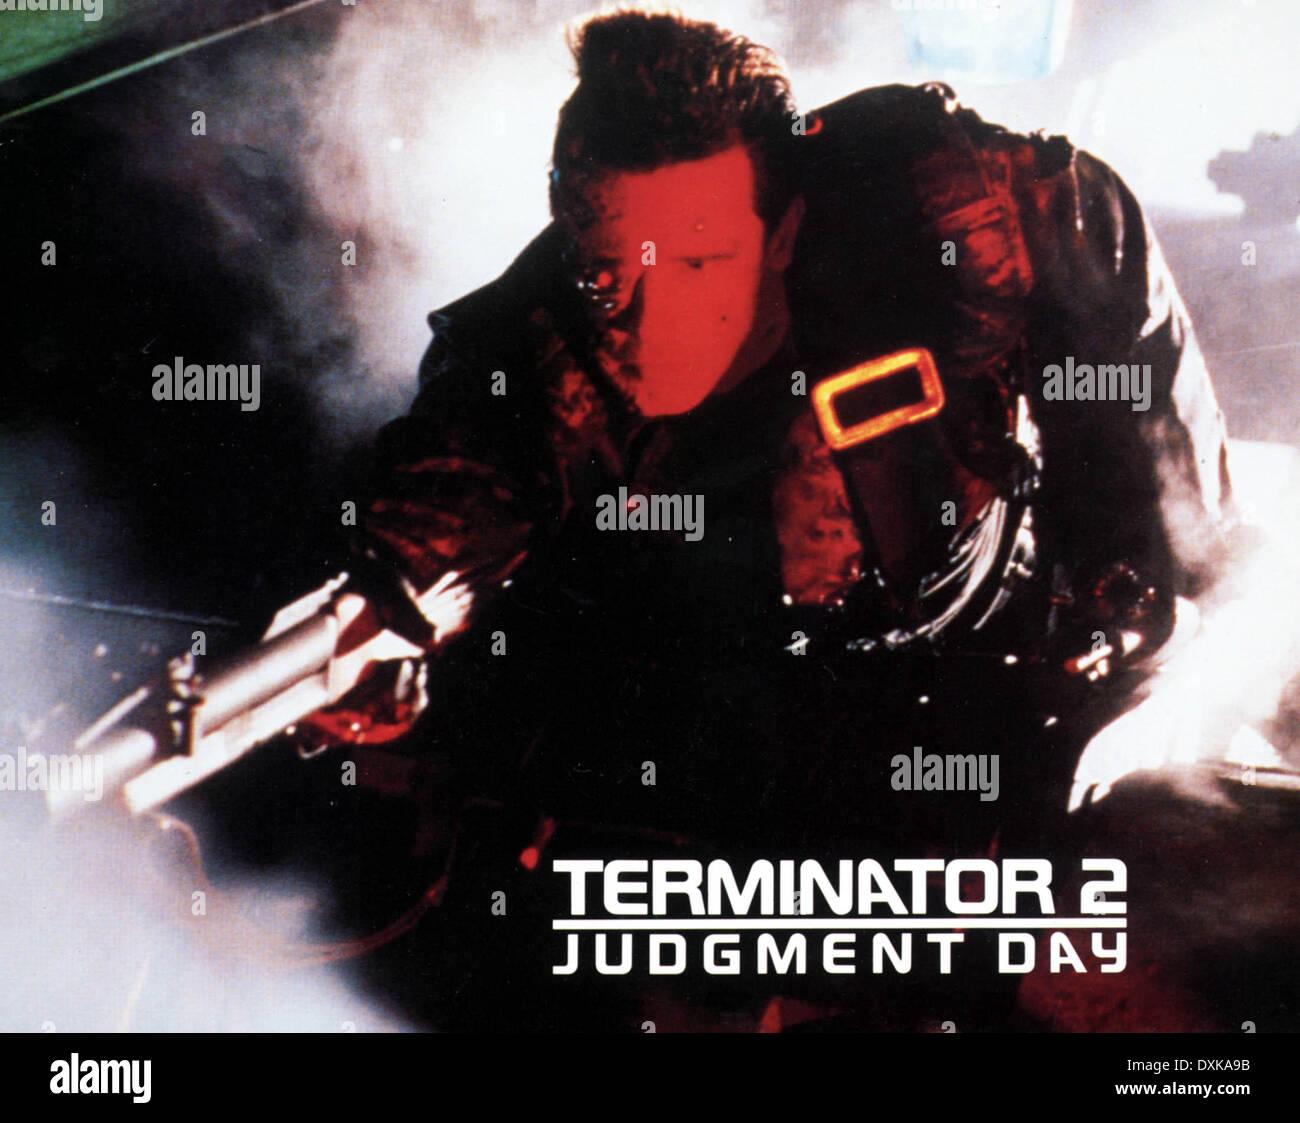 TERMINATOR 2  JUDGEMENT DAY - Stock Image